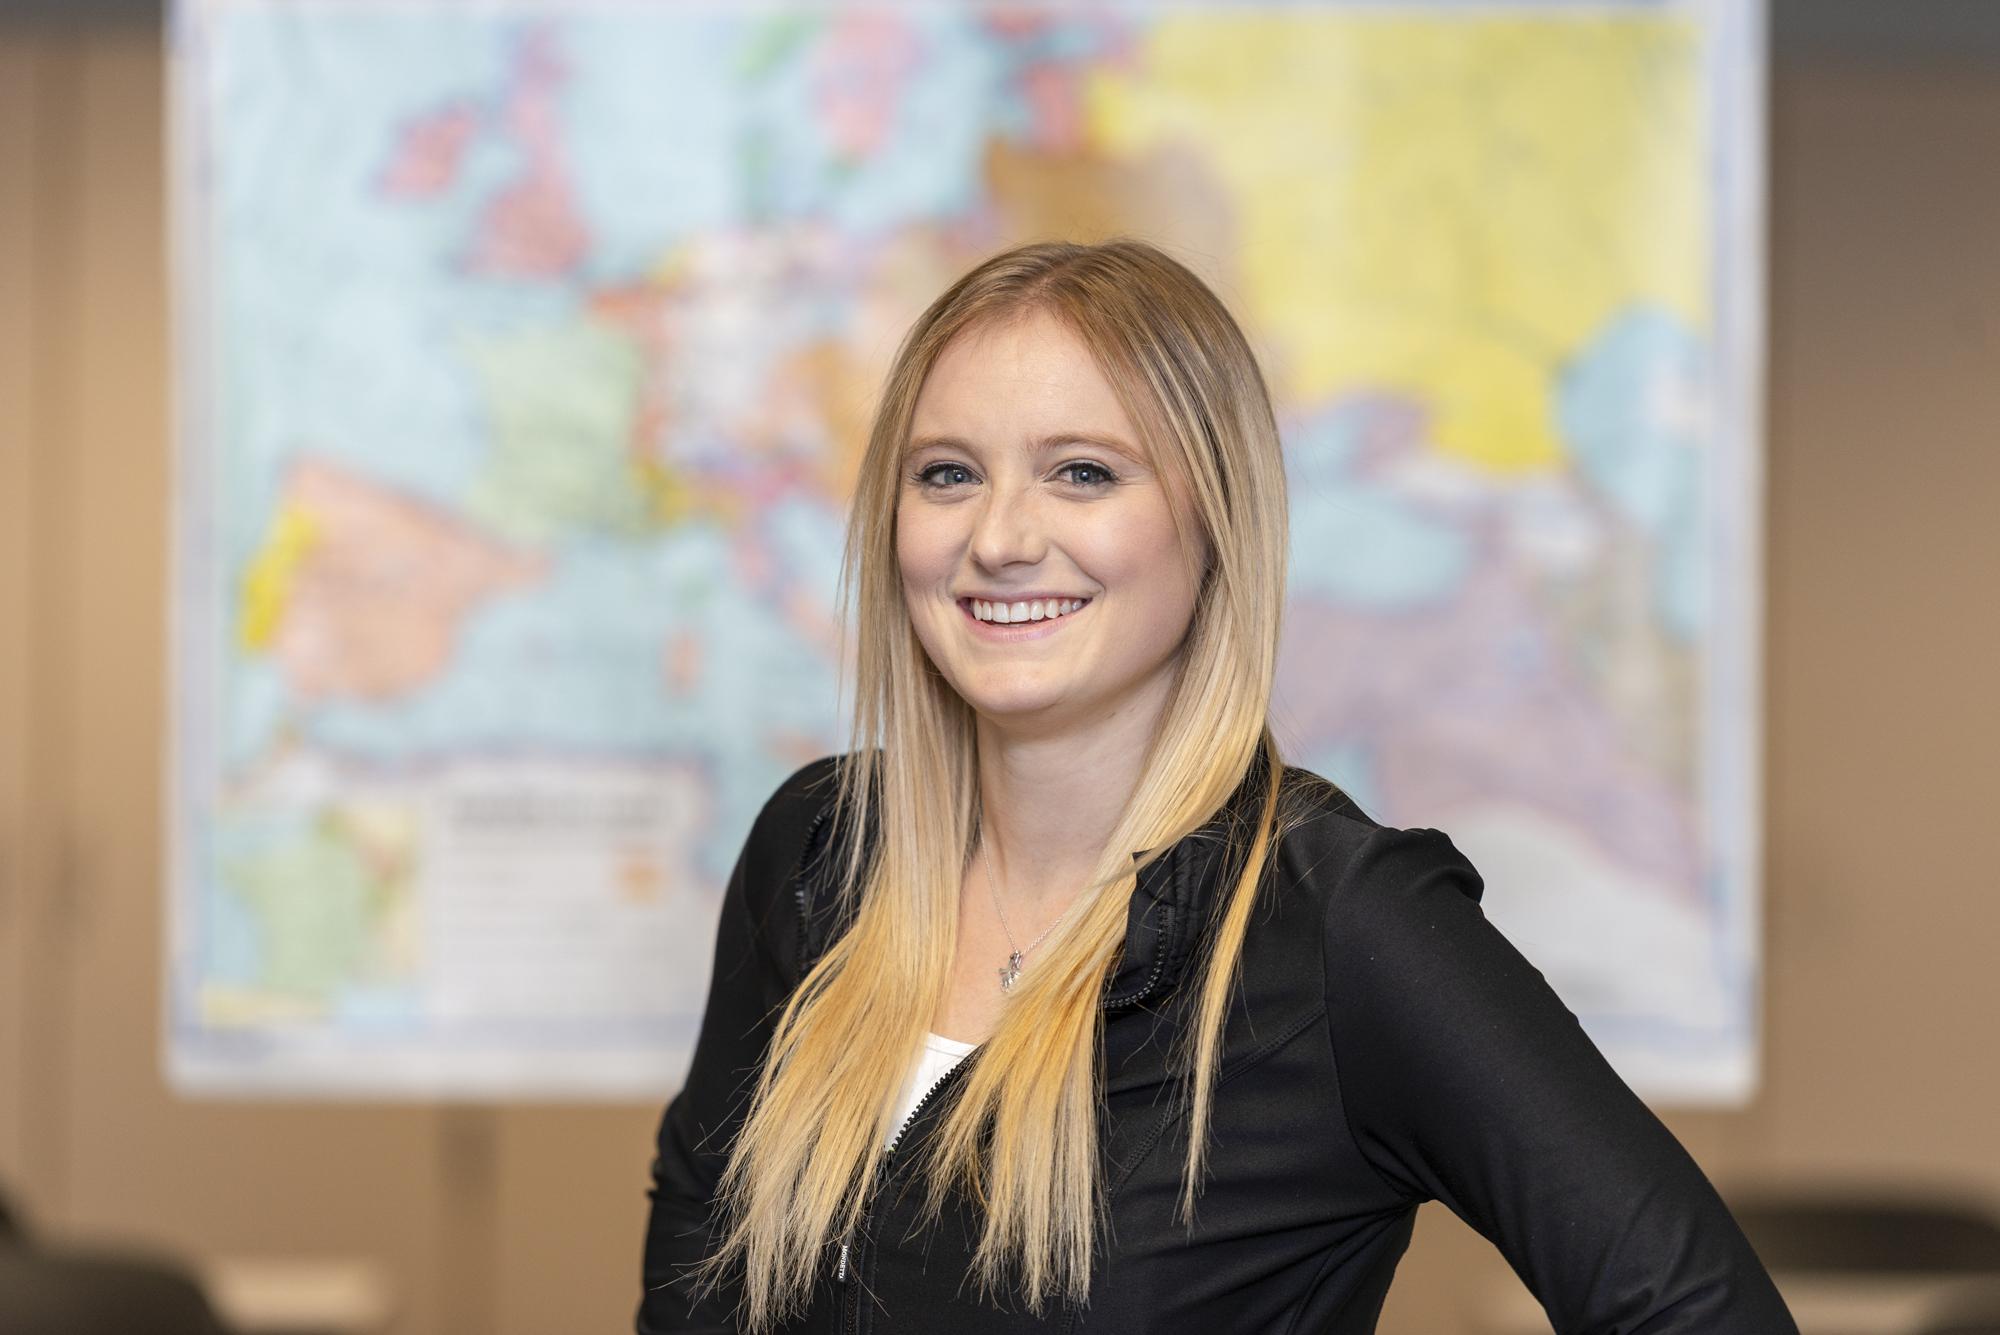 Kellogg Community College student Victoria Elyea.